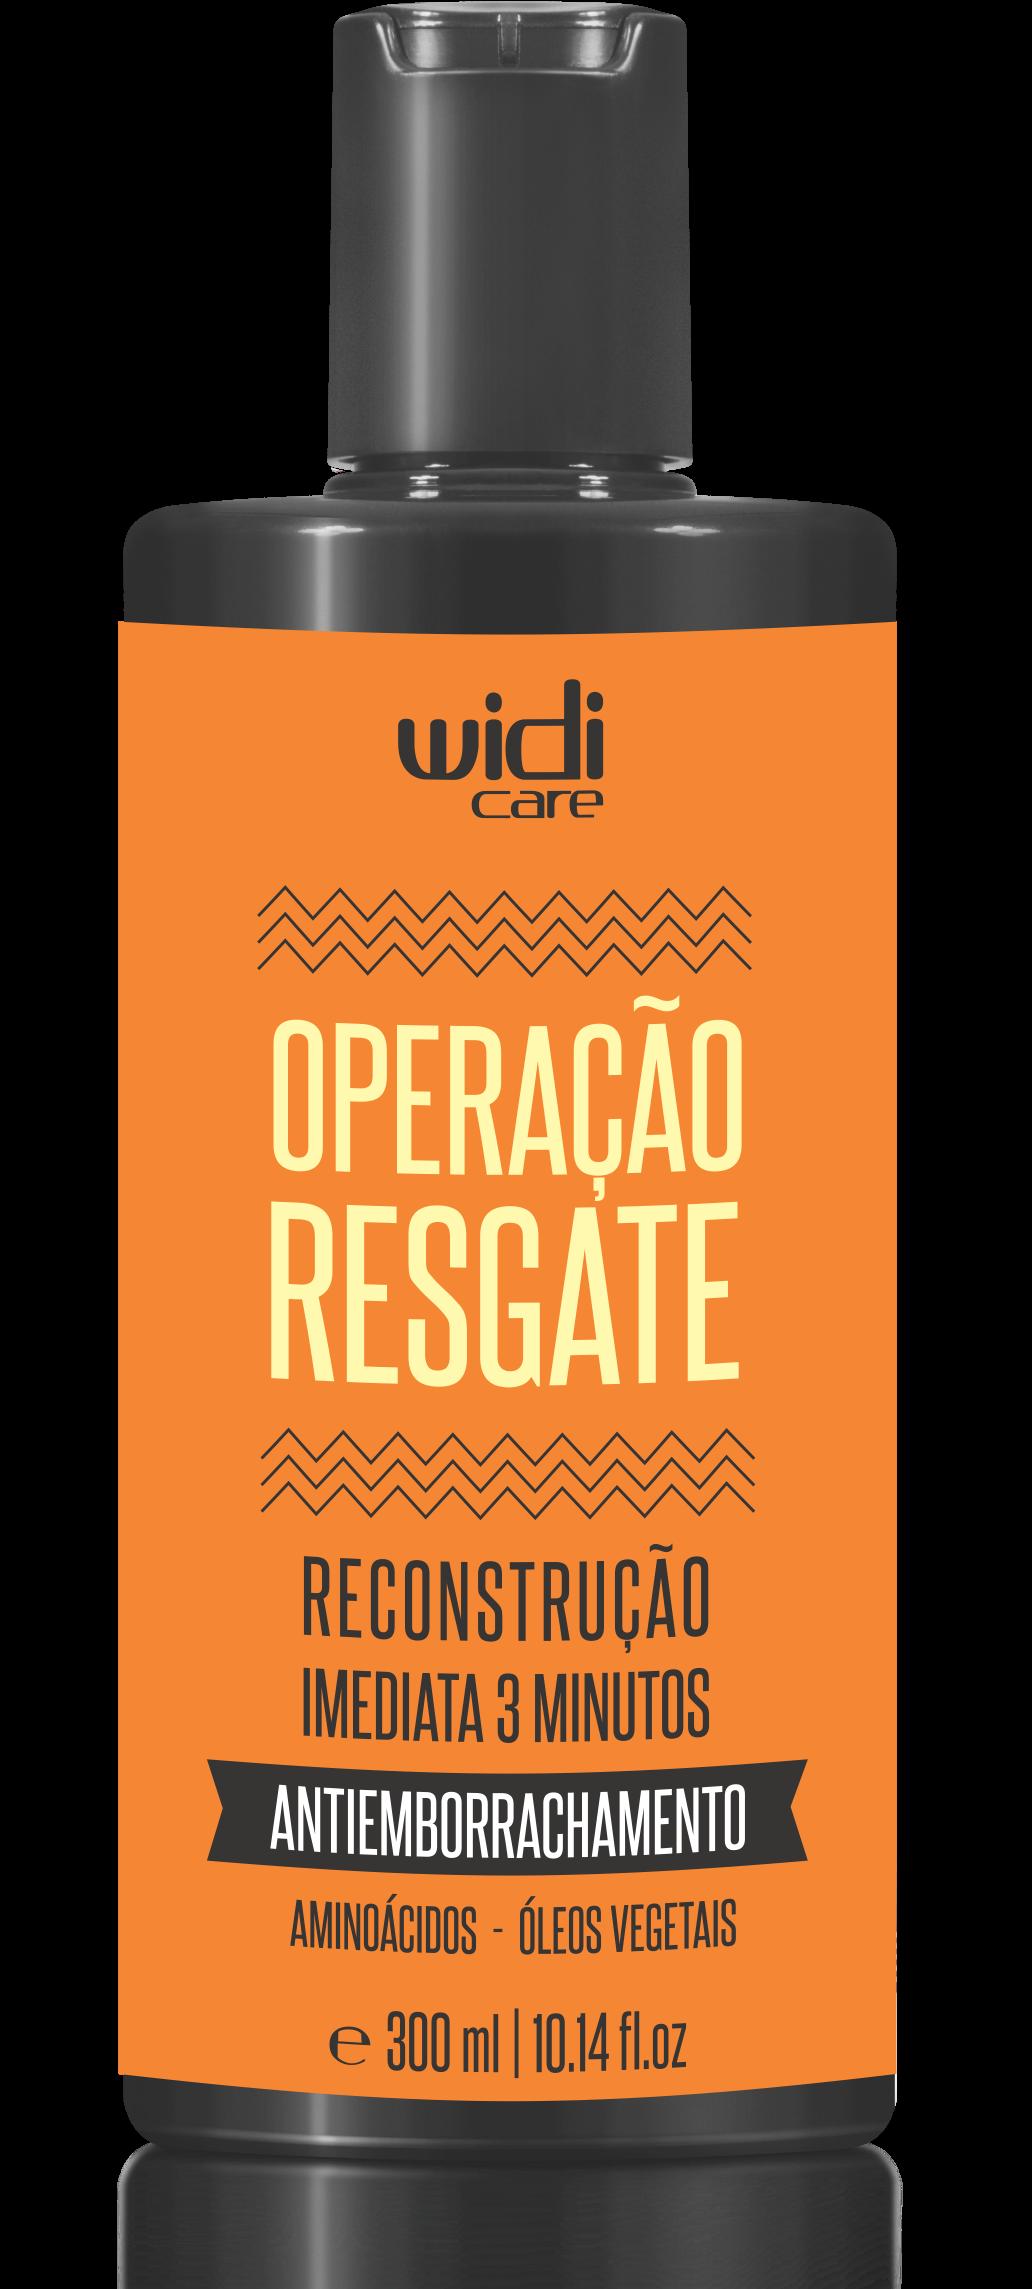 WIDI - OPERAÇÃO RESGATE - ANTIEMBORRACHAMENTO - 300ml